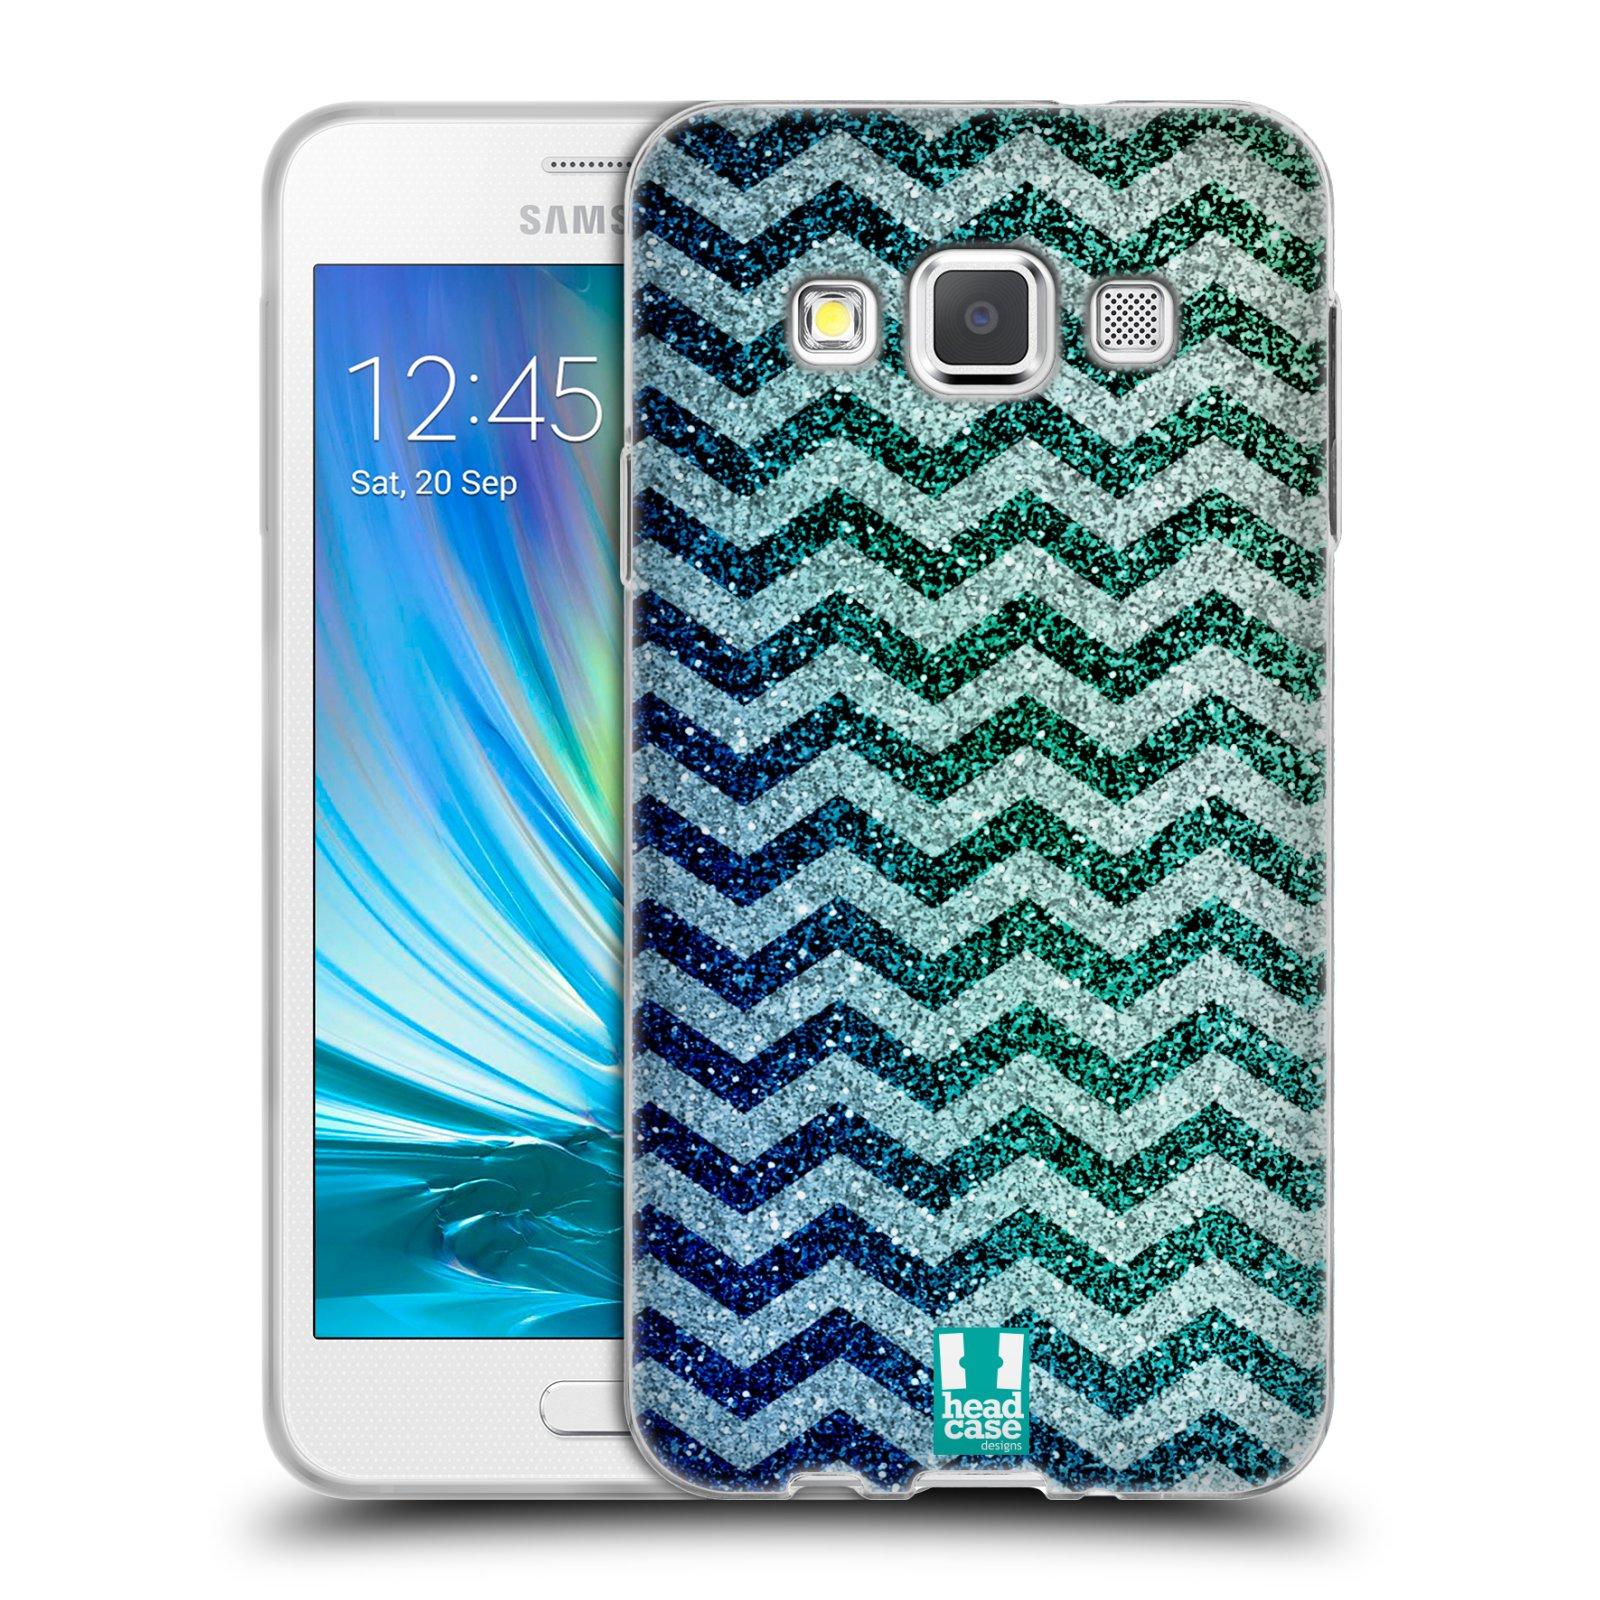 Silikonové pouzdro na mobil Samsung Galaxy A3 HEAD CASE MIX CHEVRON